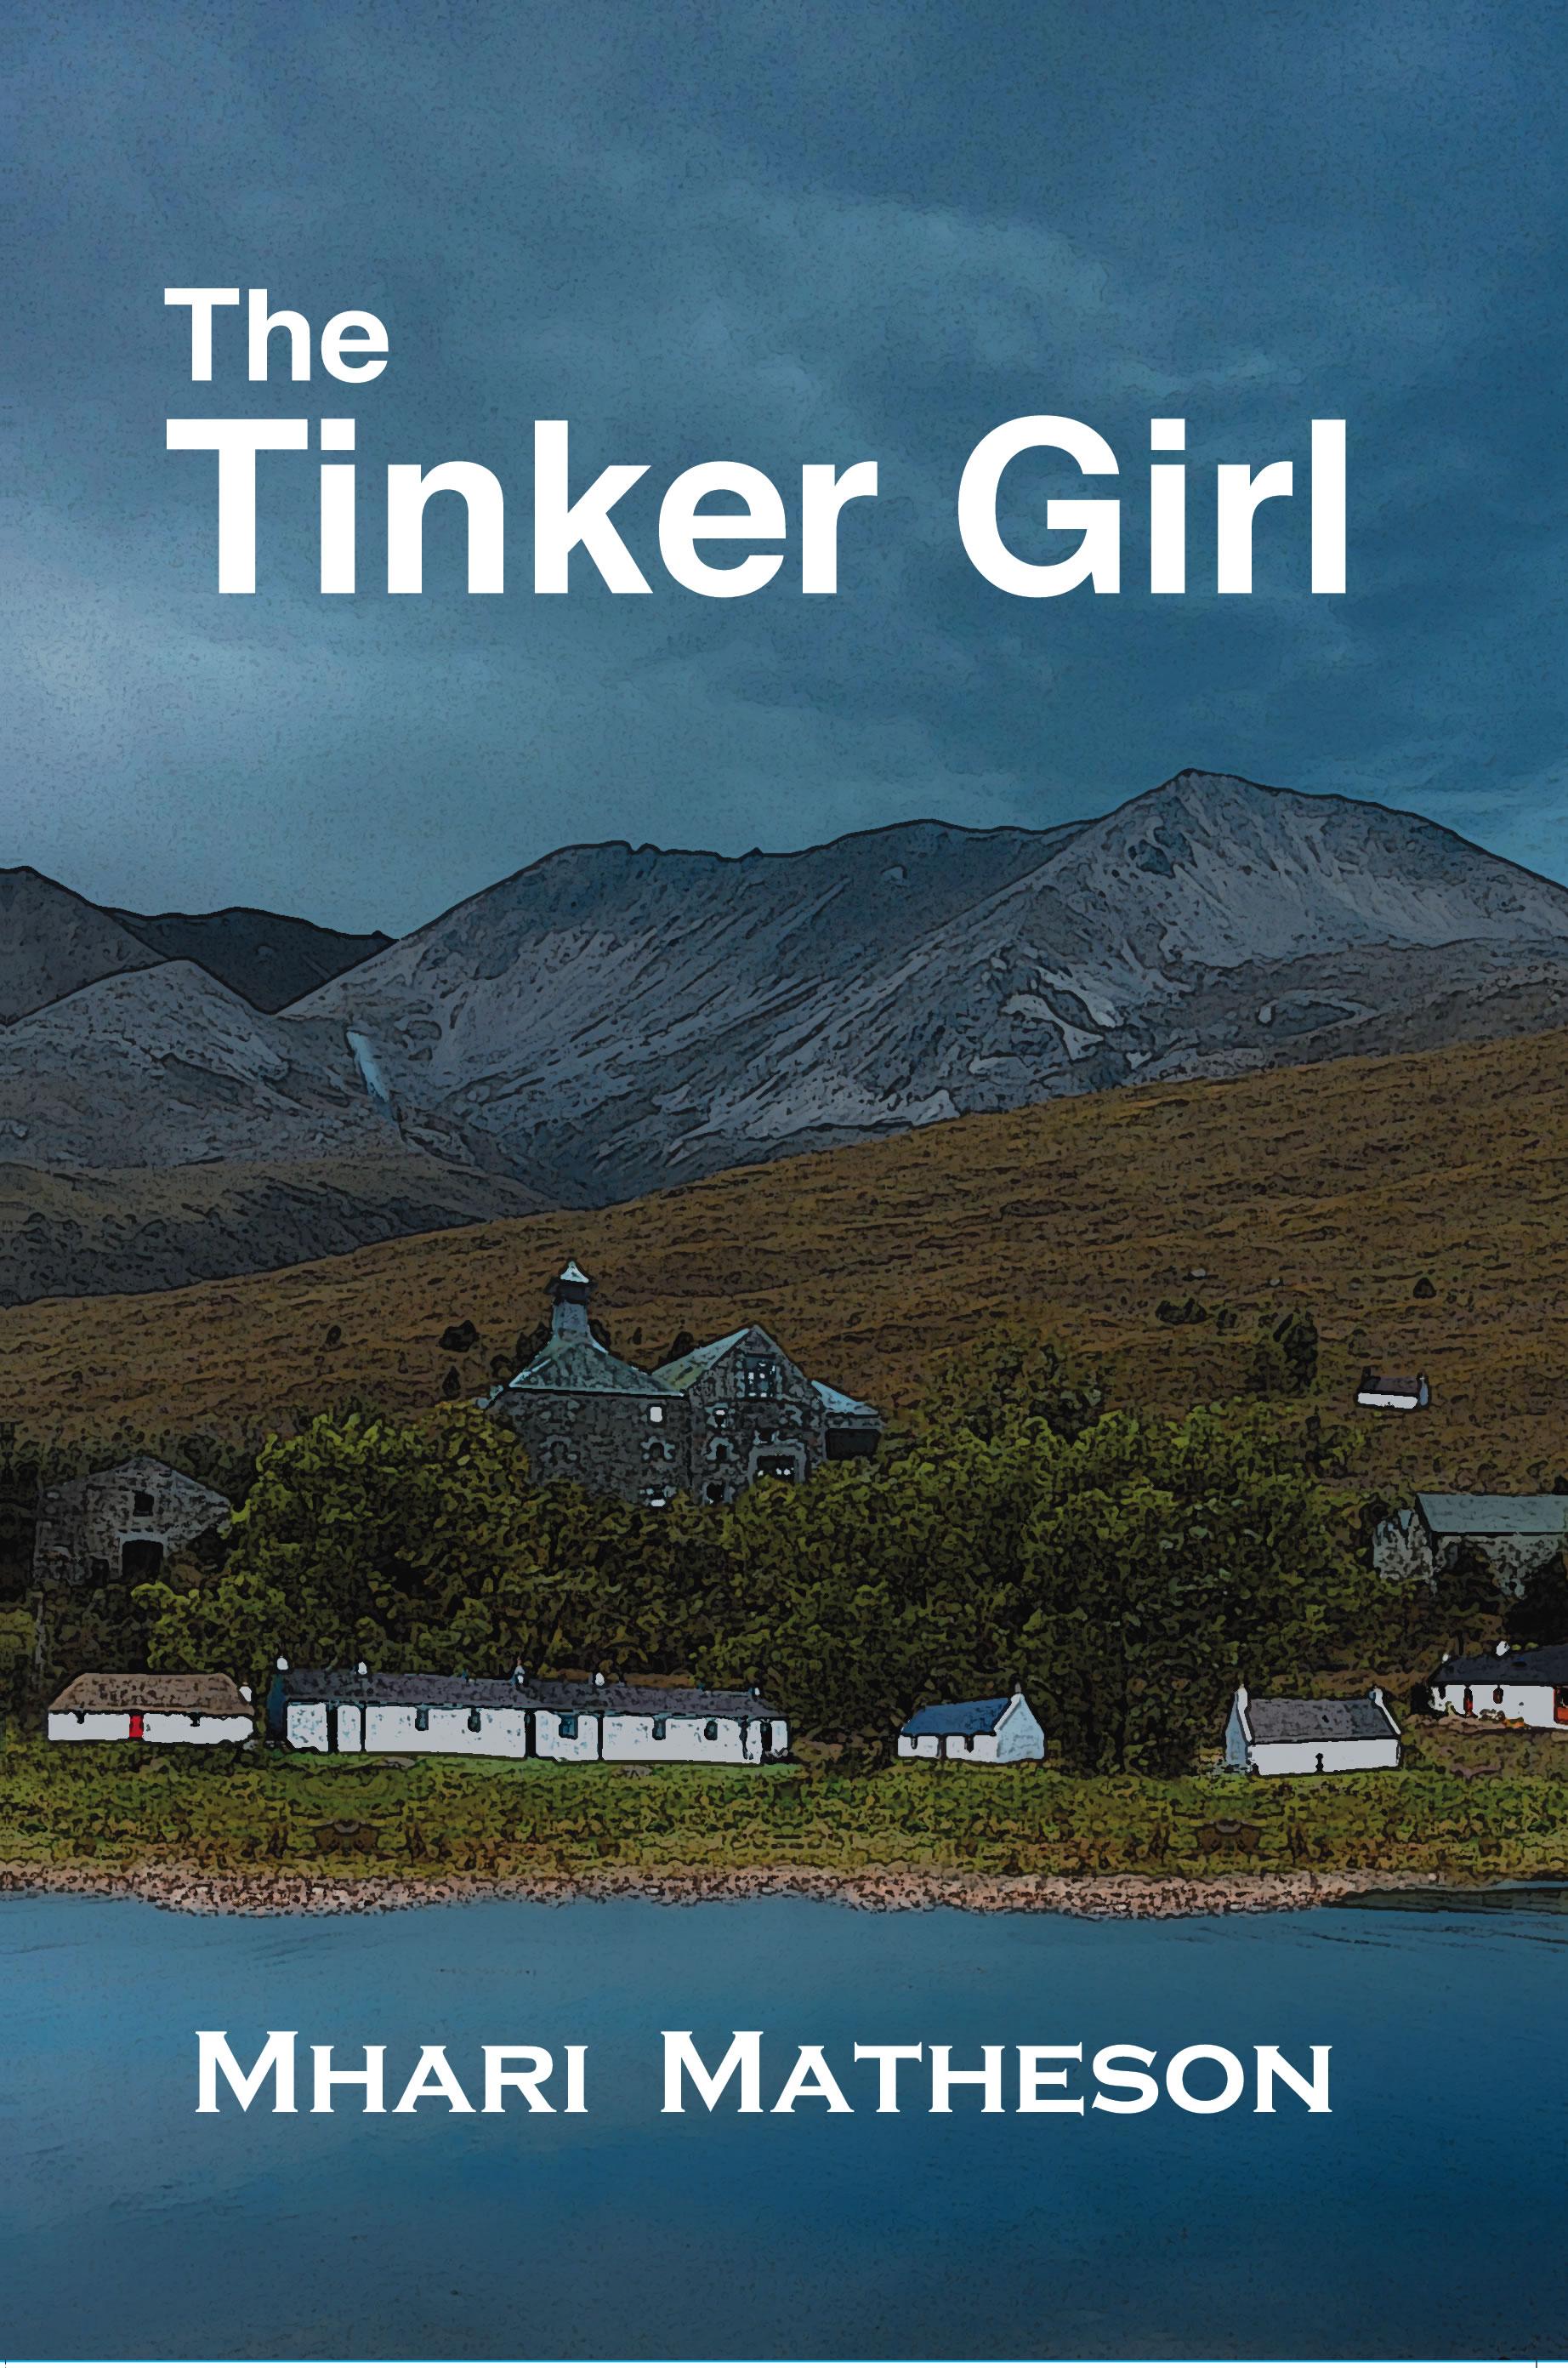 The Tinker Girl - Mhari Matheson